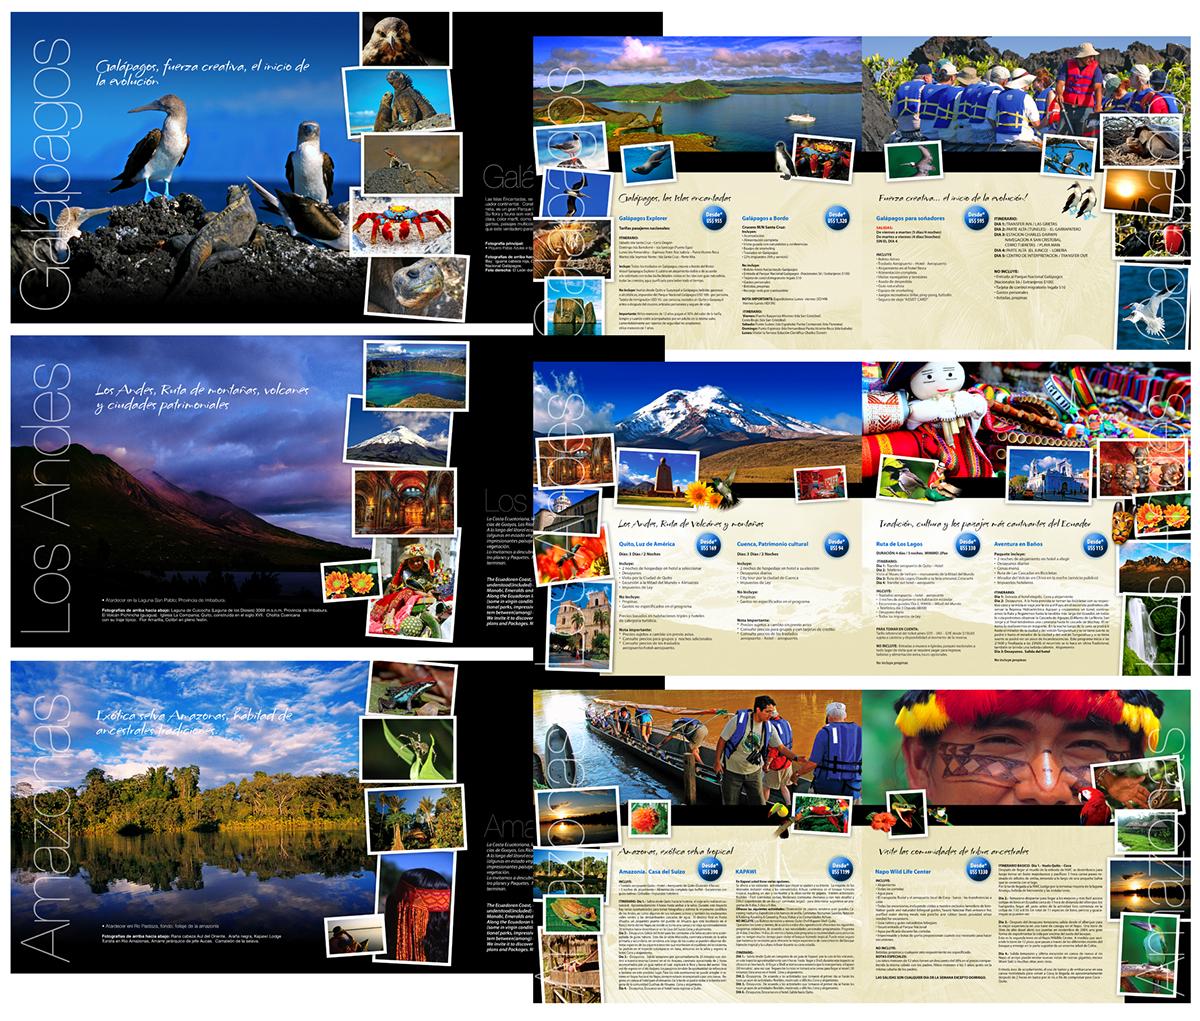 Travel Ecuador guayaquil Galapagos Amazon Coast adventure folleto brochure revista